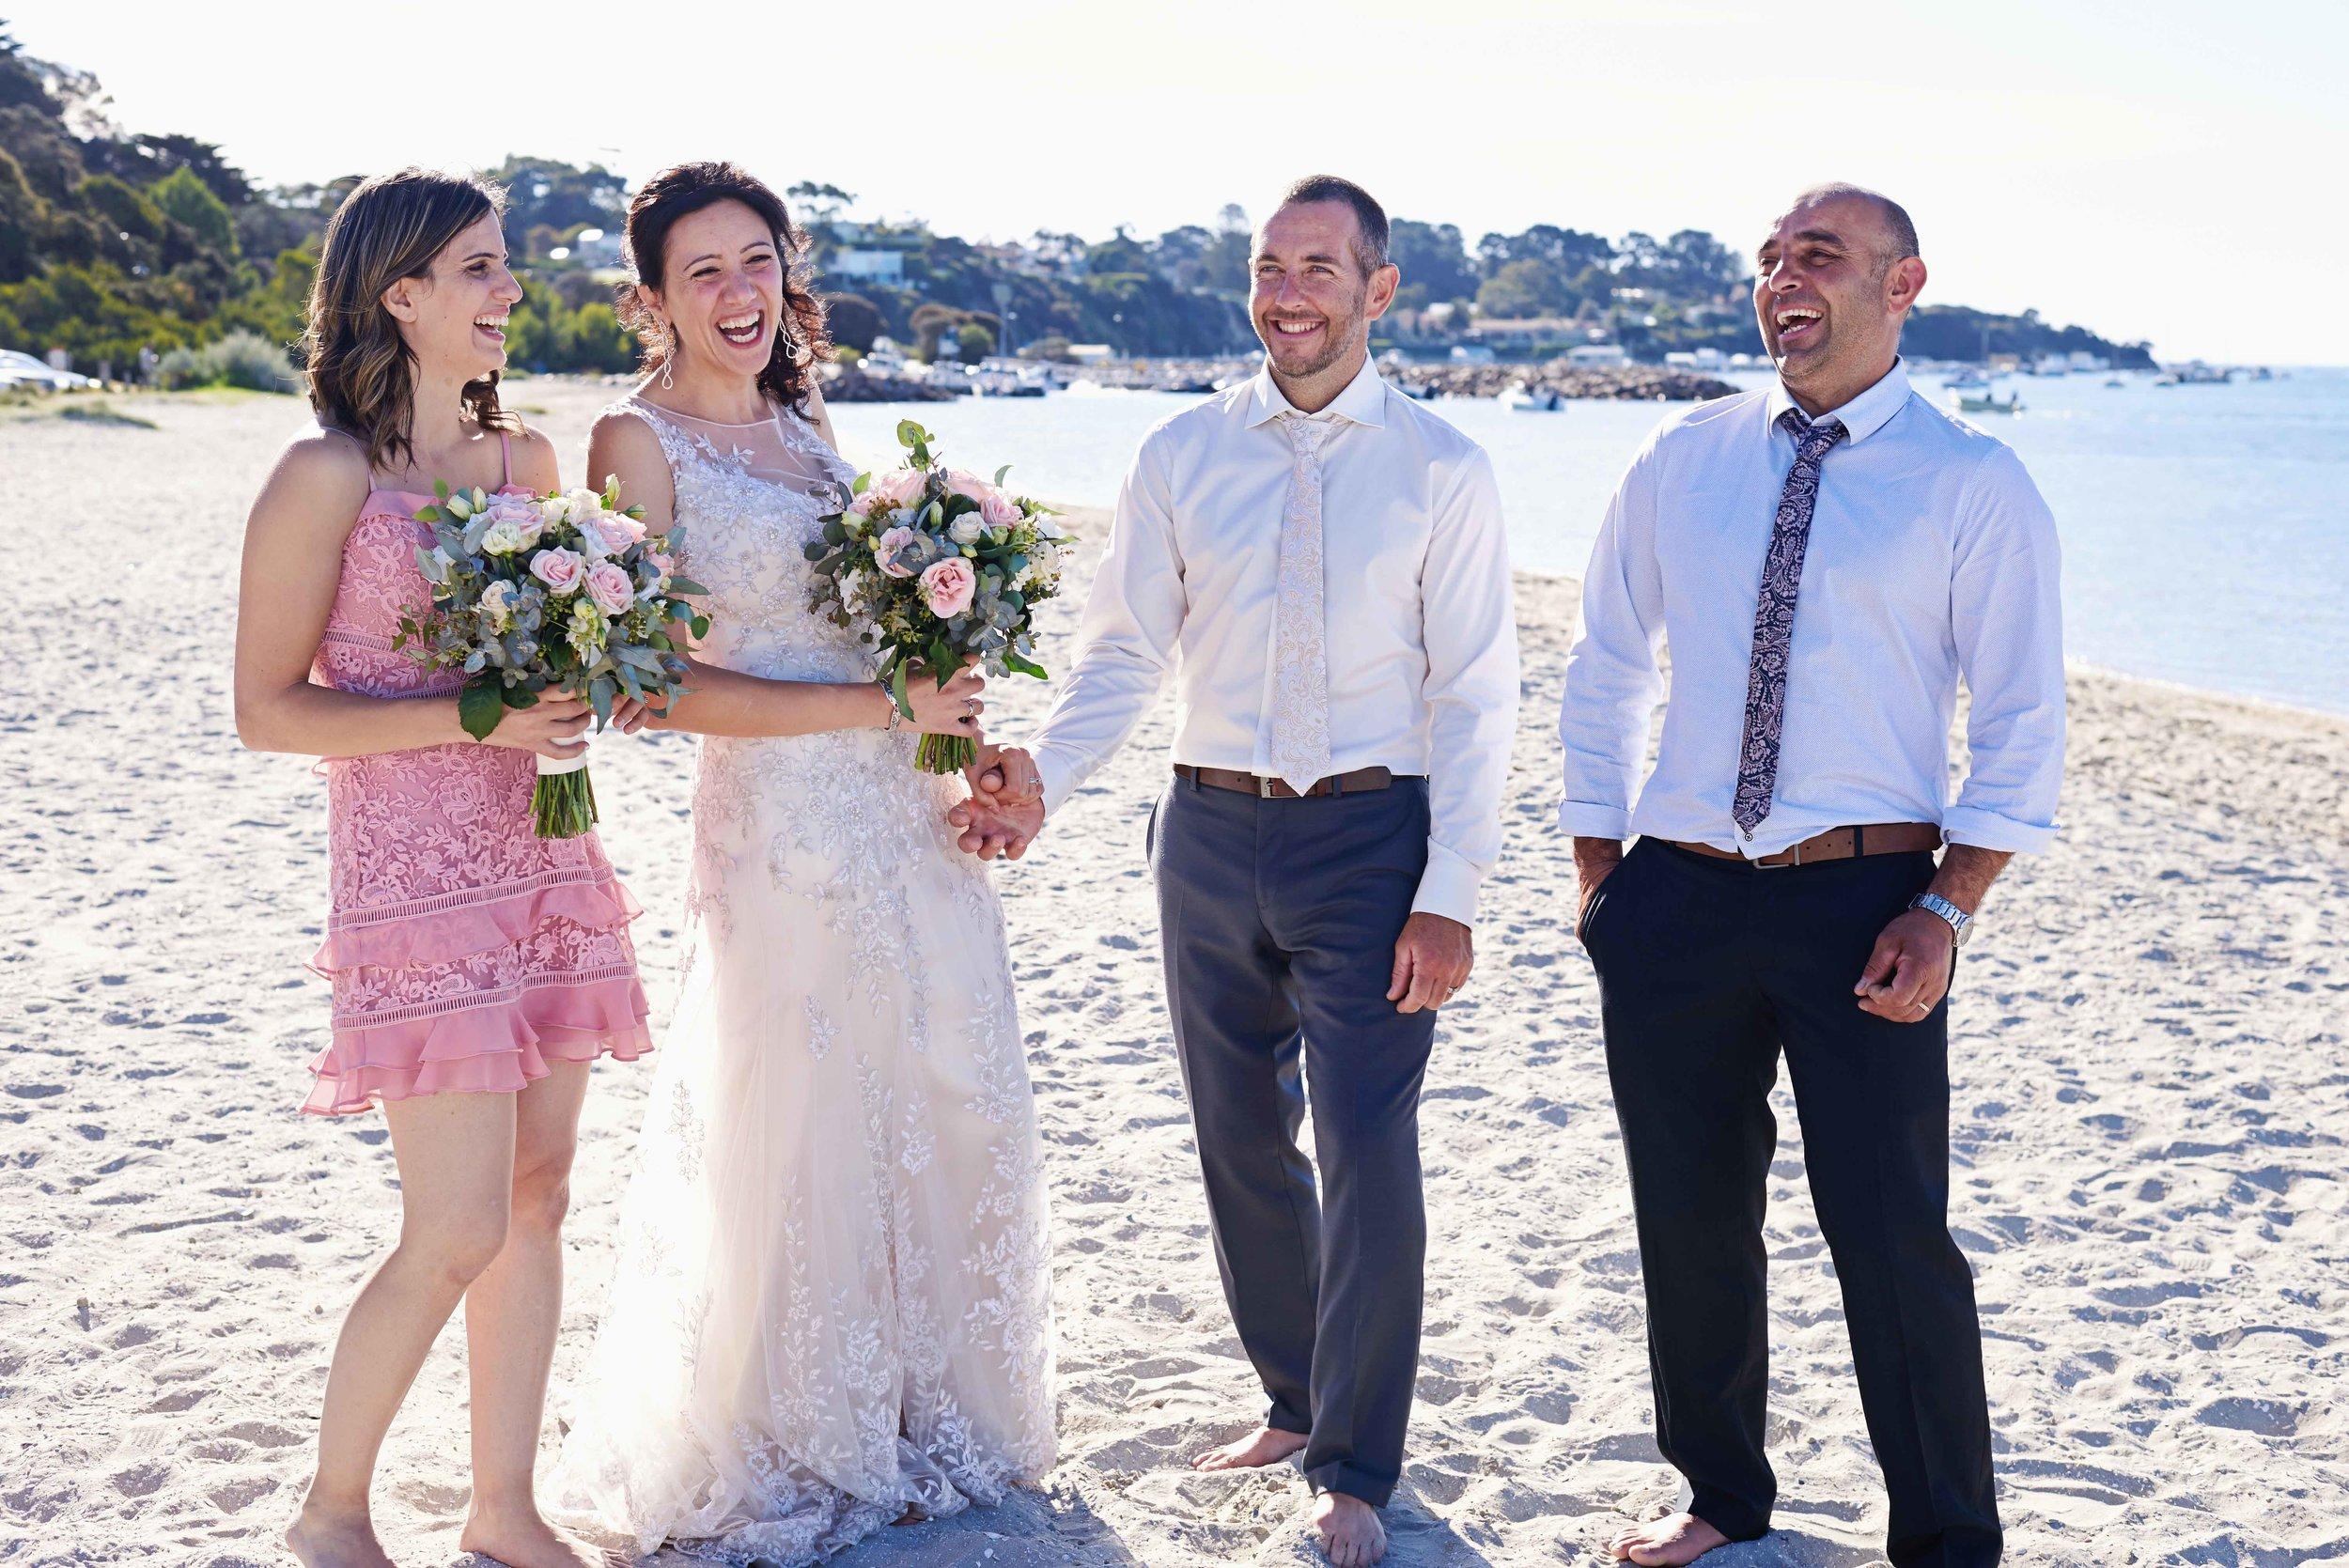 sorrento-wedding-photography-all-smiles-marissa-jade-photography-169.jpg